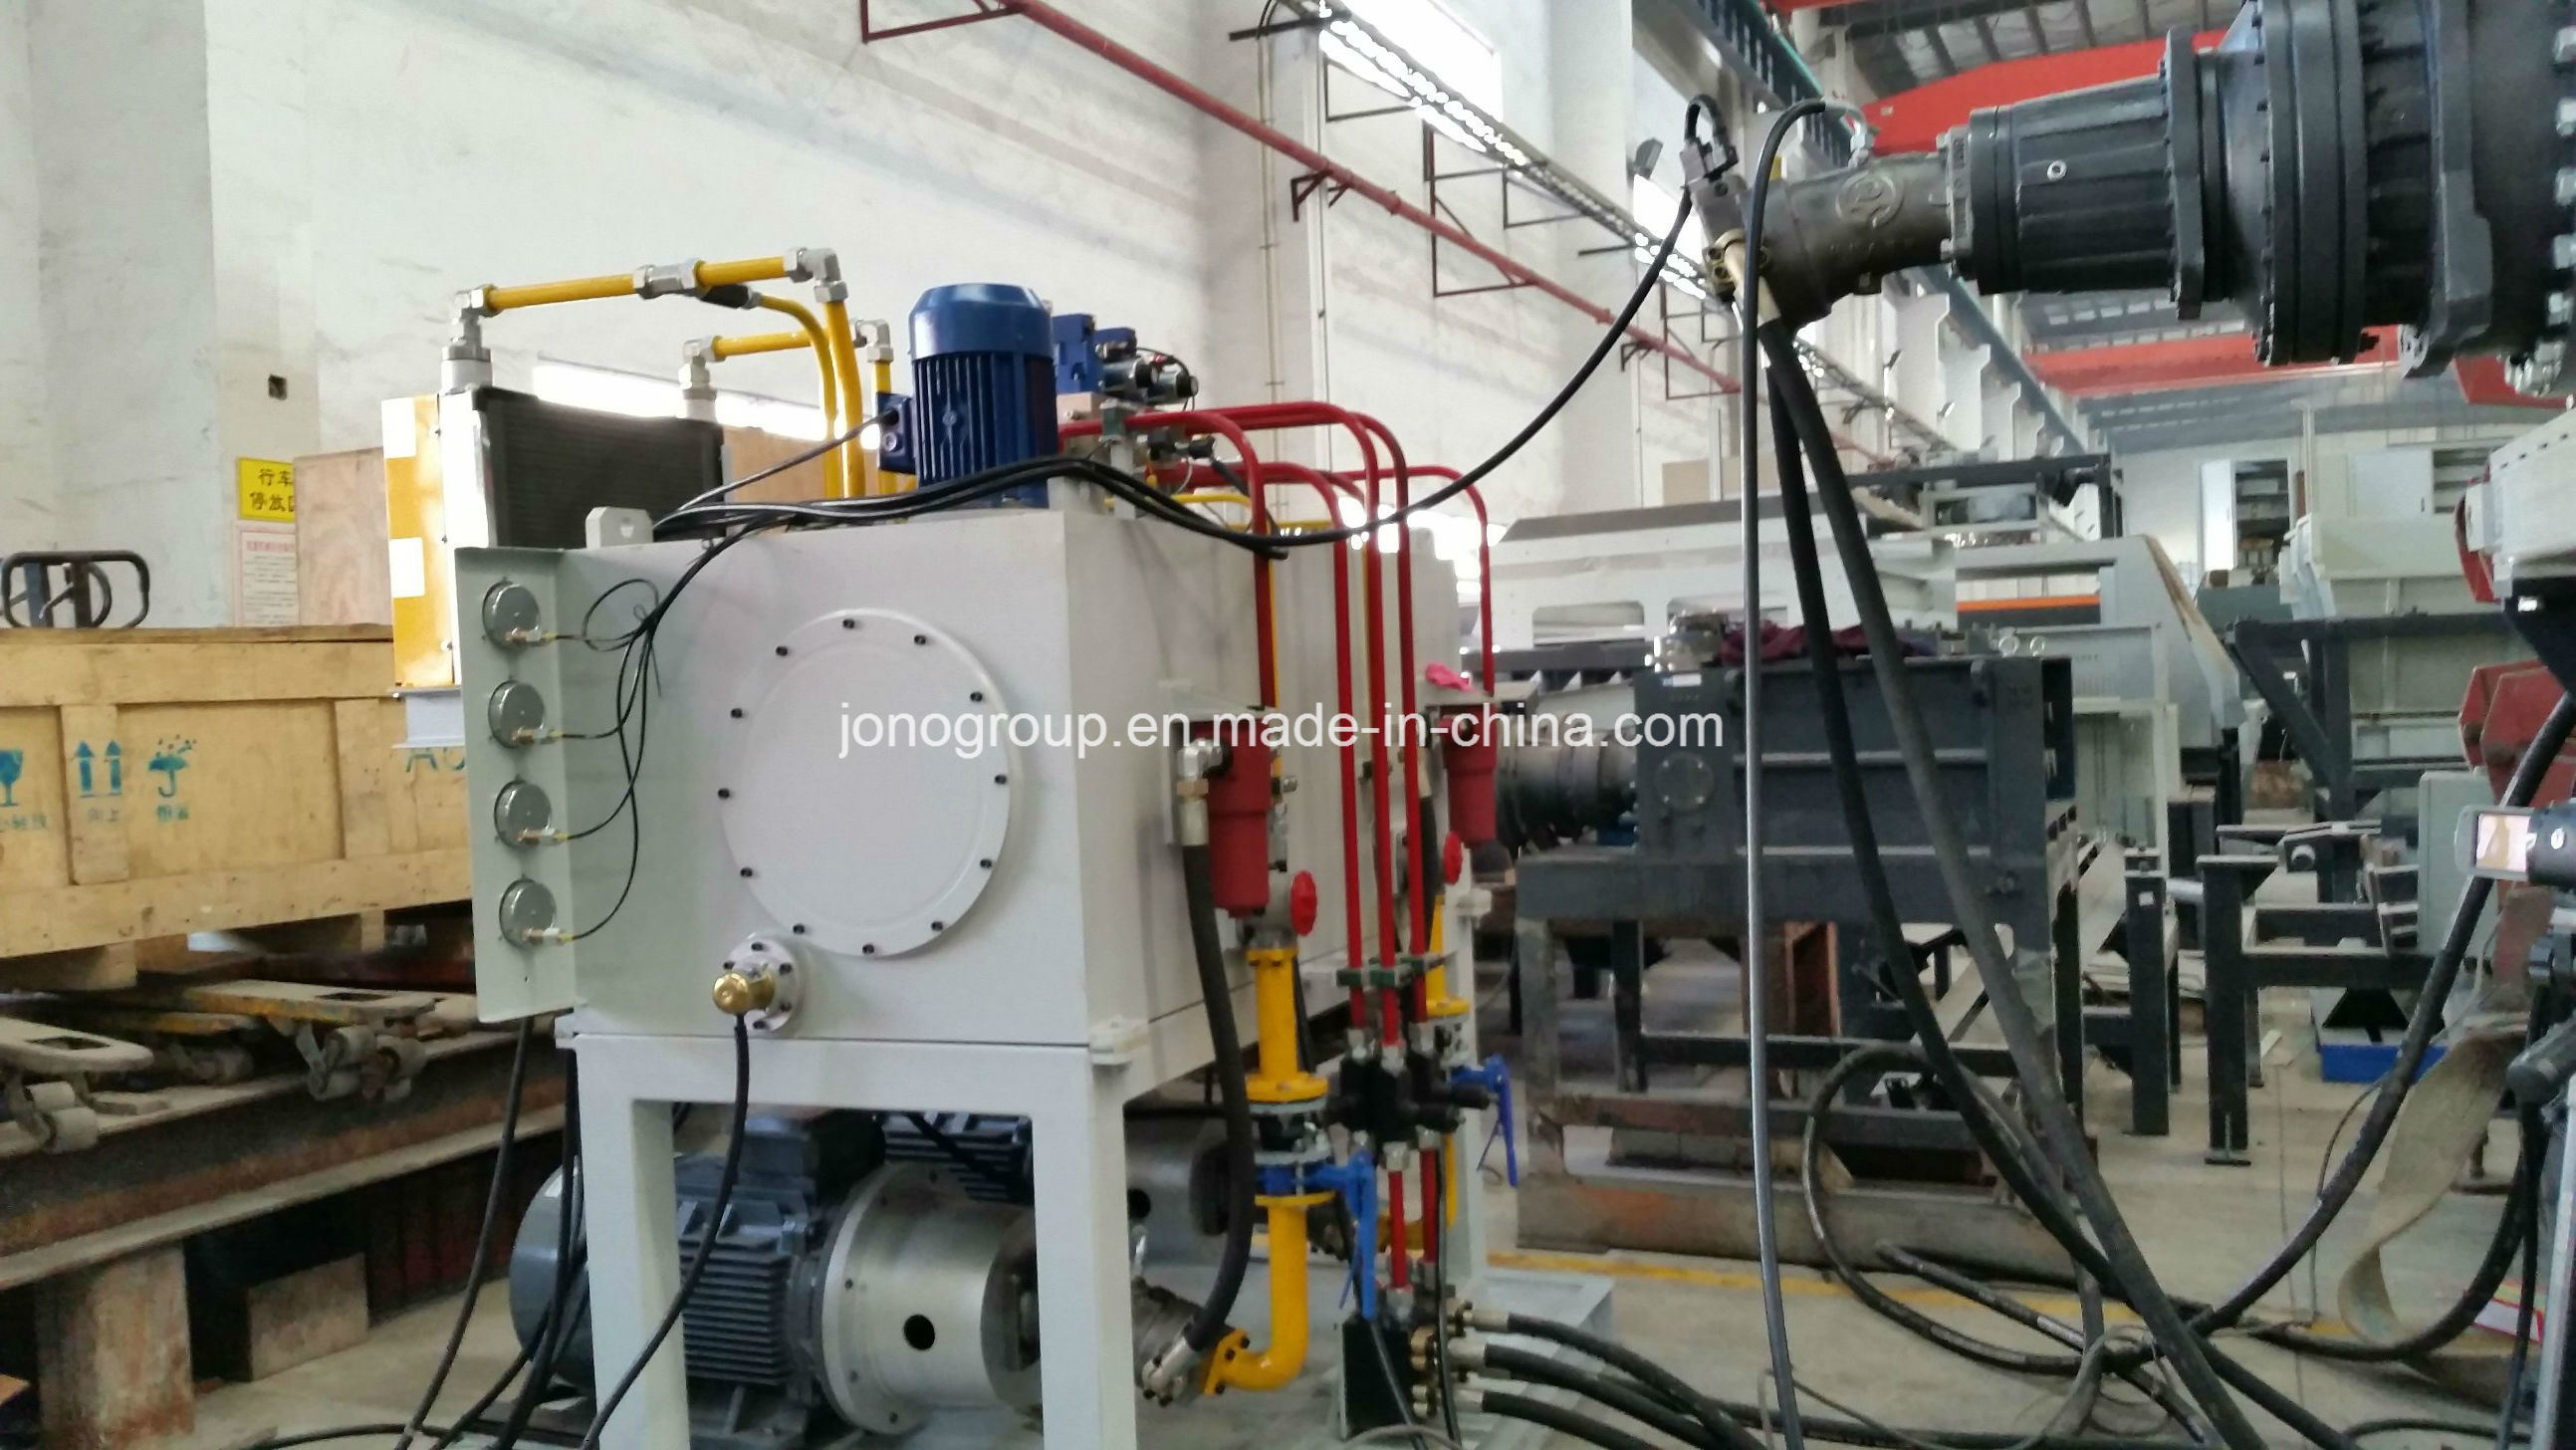 Dual-Shaft (Shear) Shredder for Metal Recycling Industry